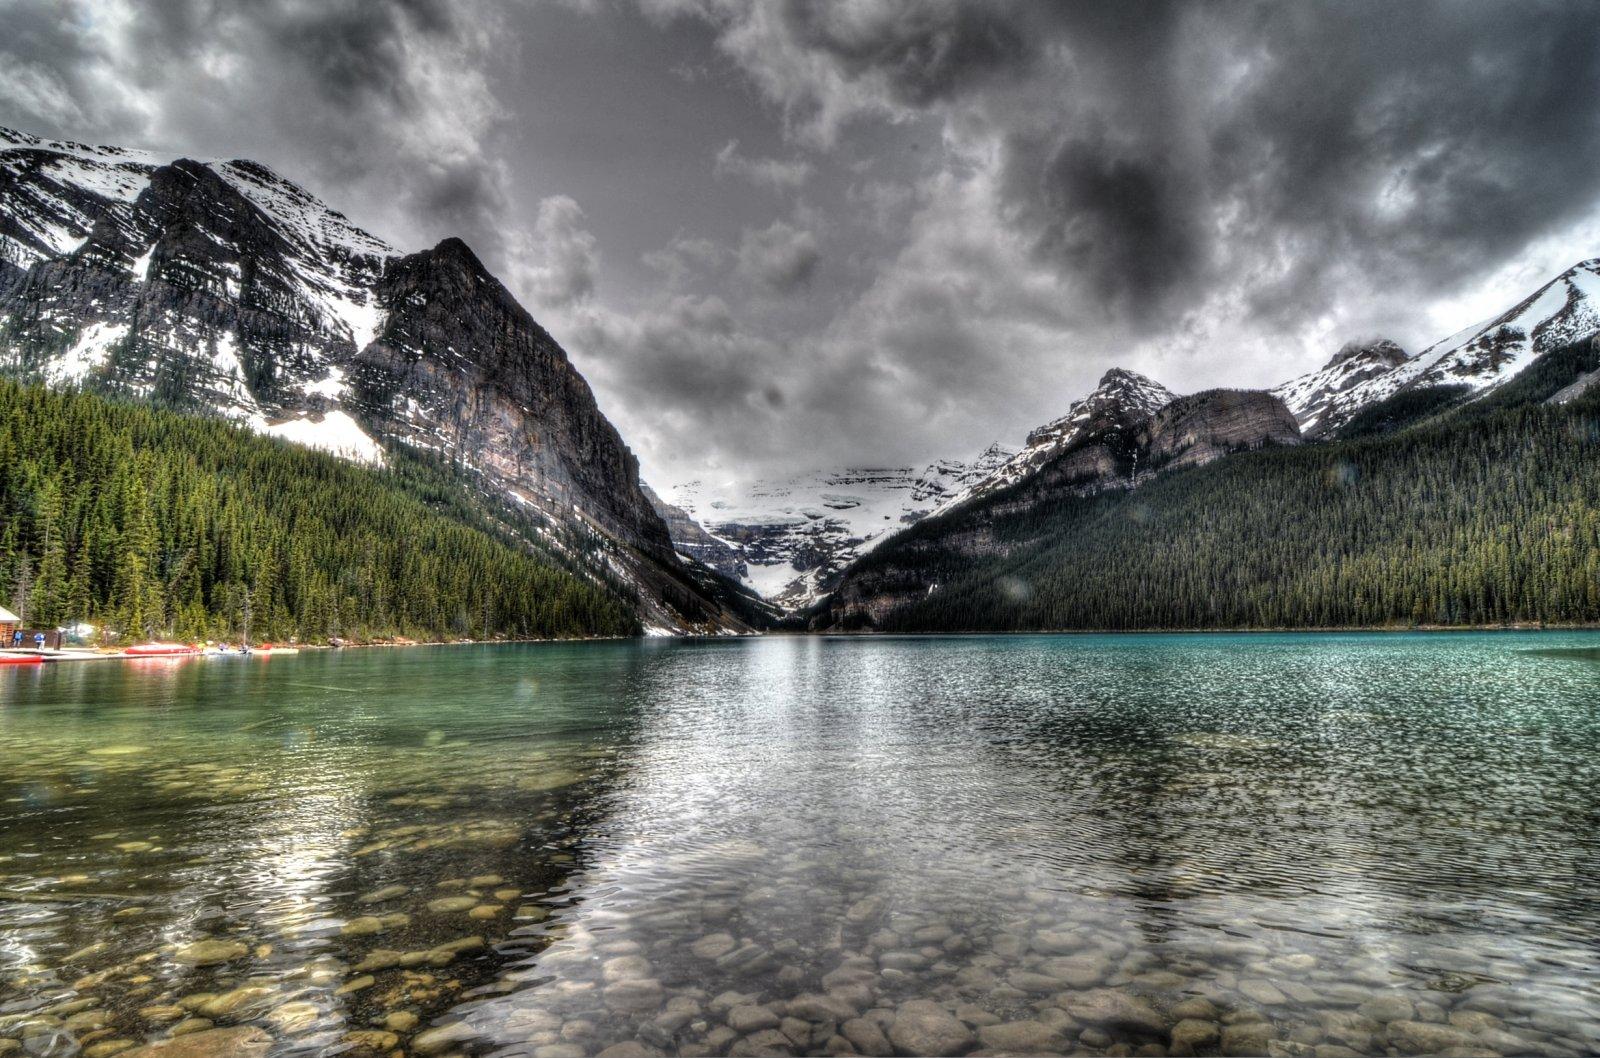 Click image for larger version  Name:lake louise.jpg Views:68 Size:395.9 KB ID:92357